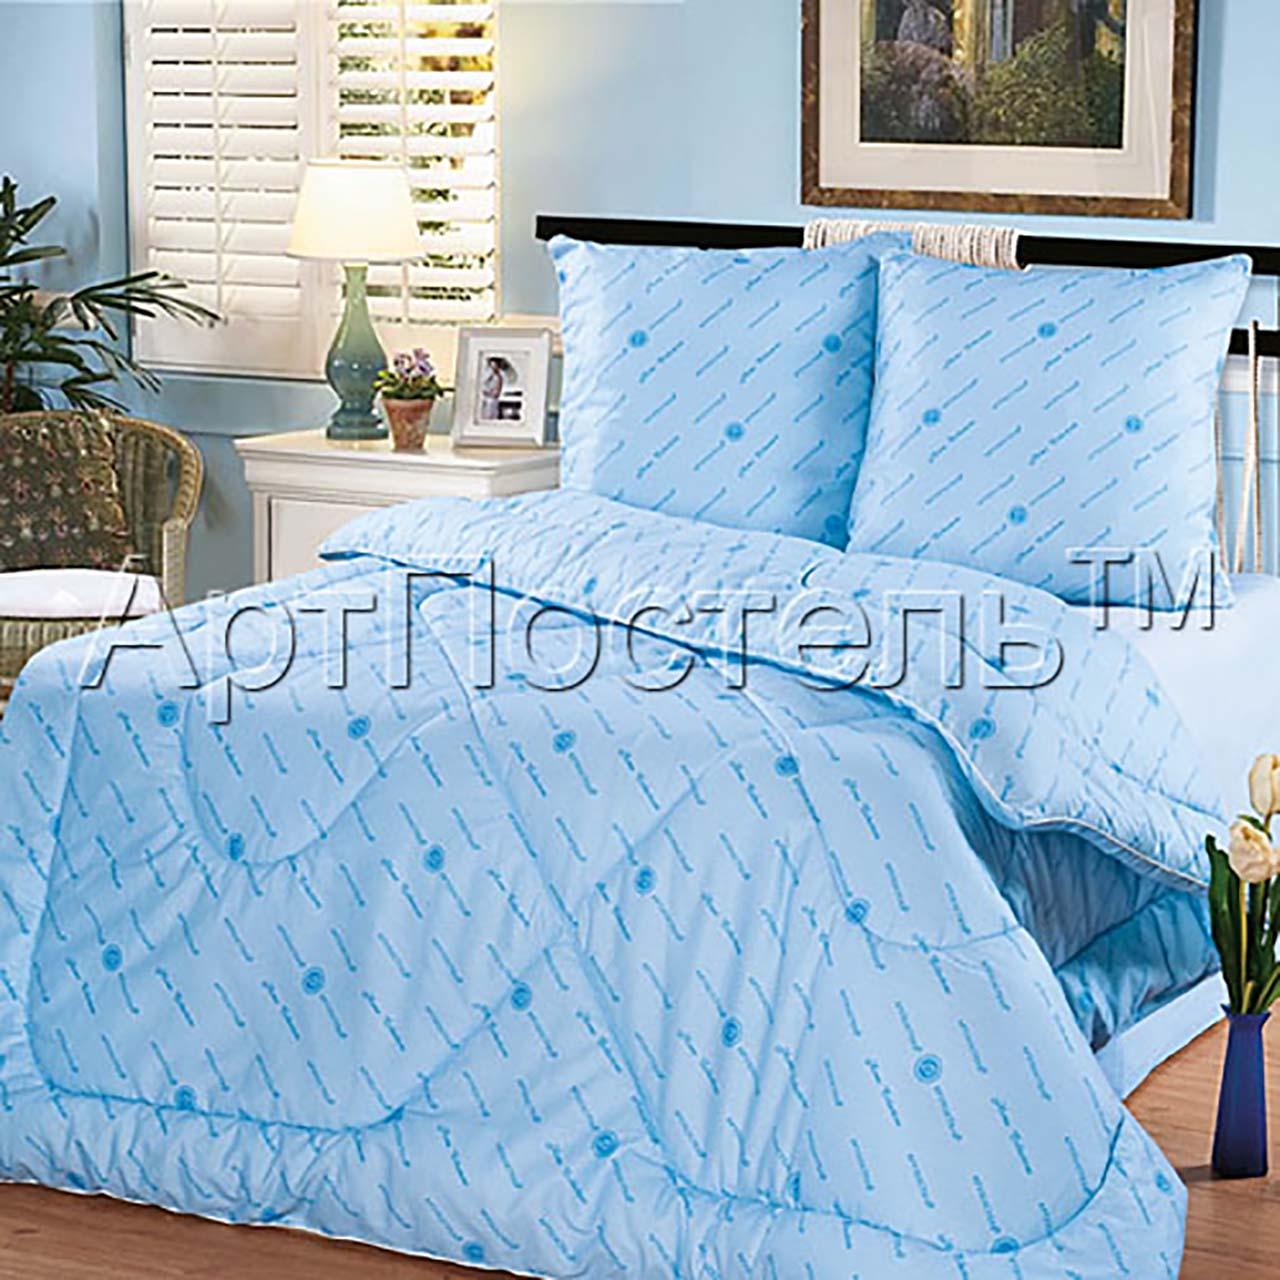 Одеяла от Grandstock